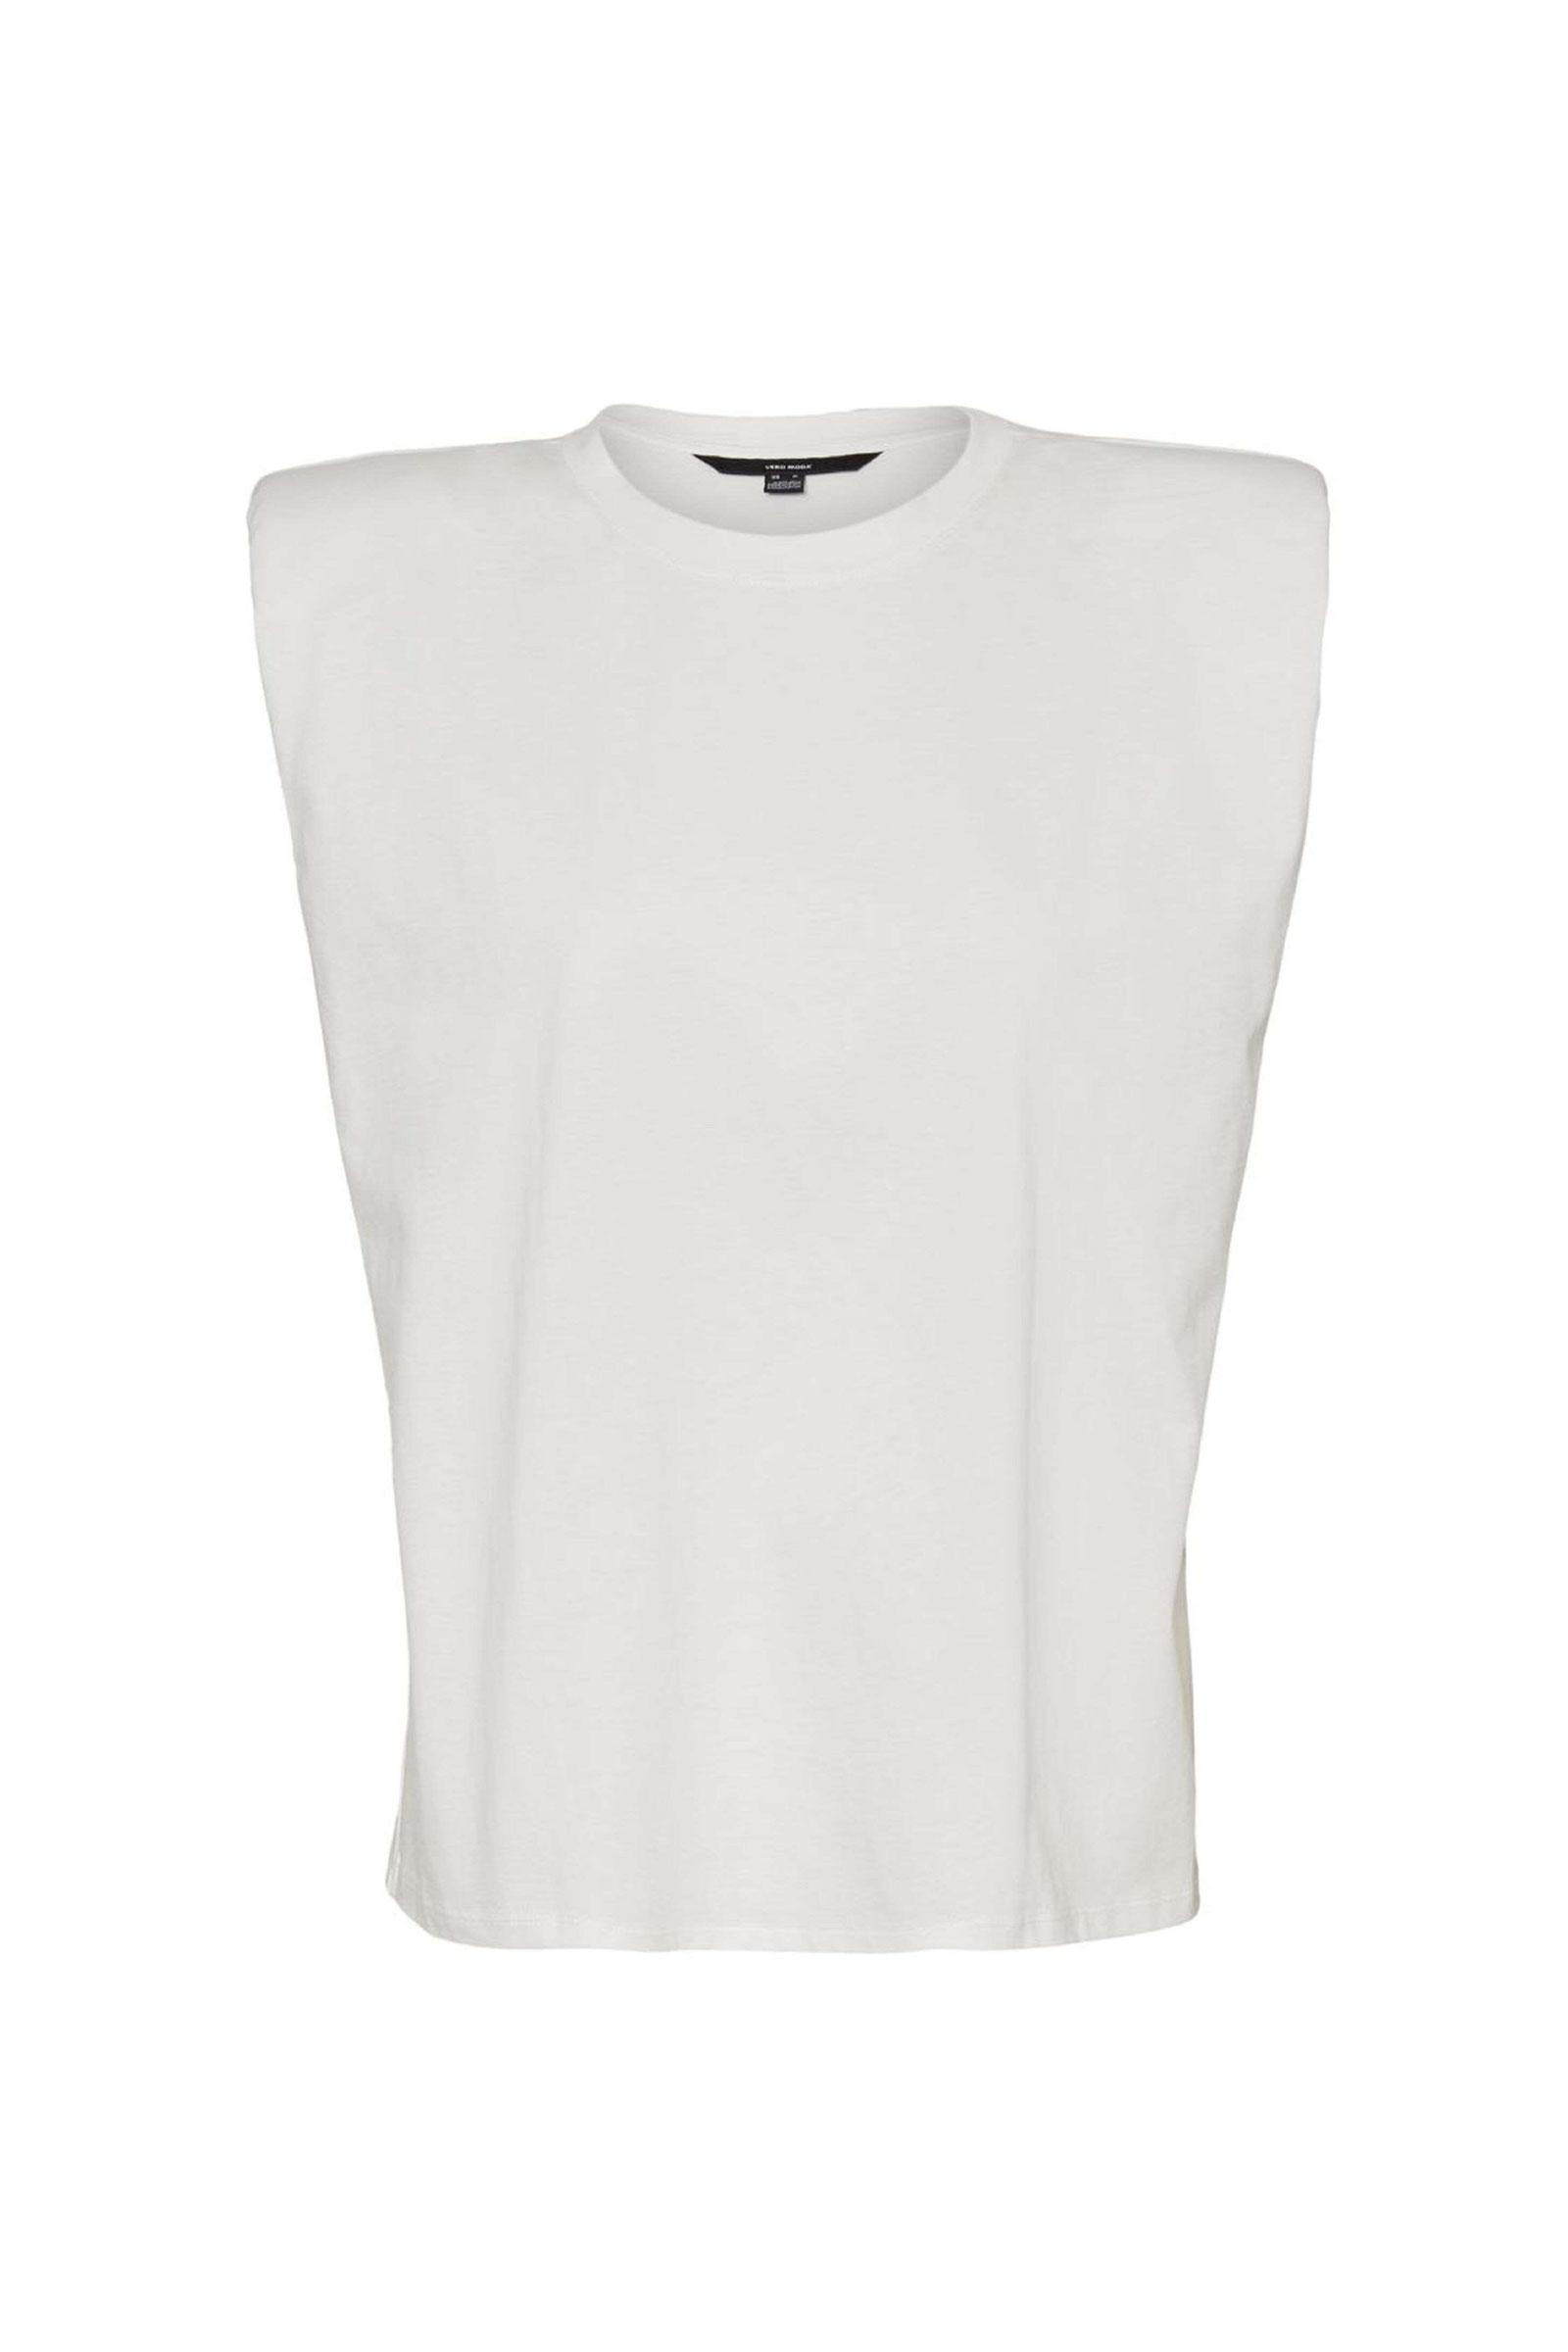 VERO MODA Women's T-Shirt VERO MODA | T-Shirt | 10240876Snow White